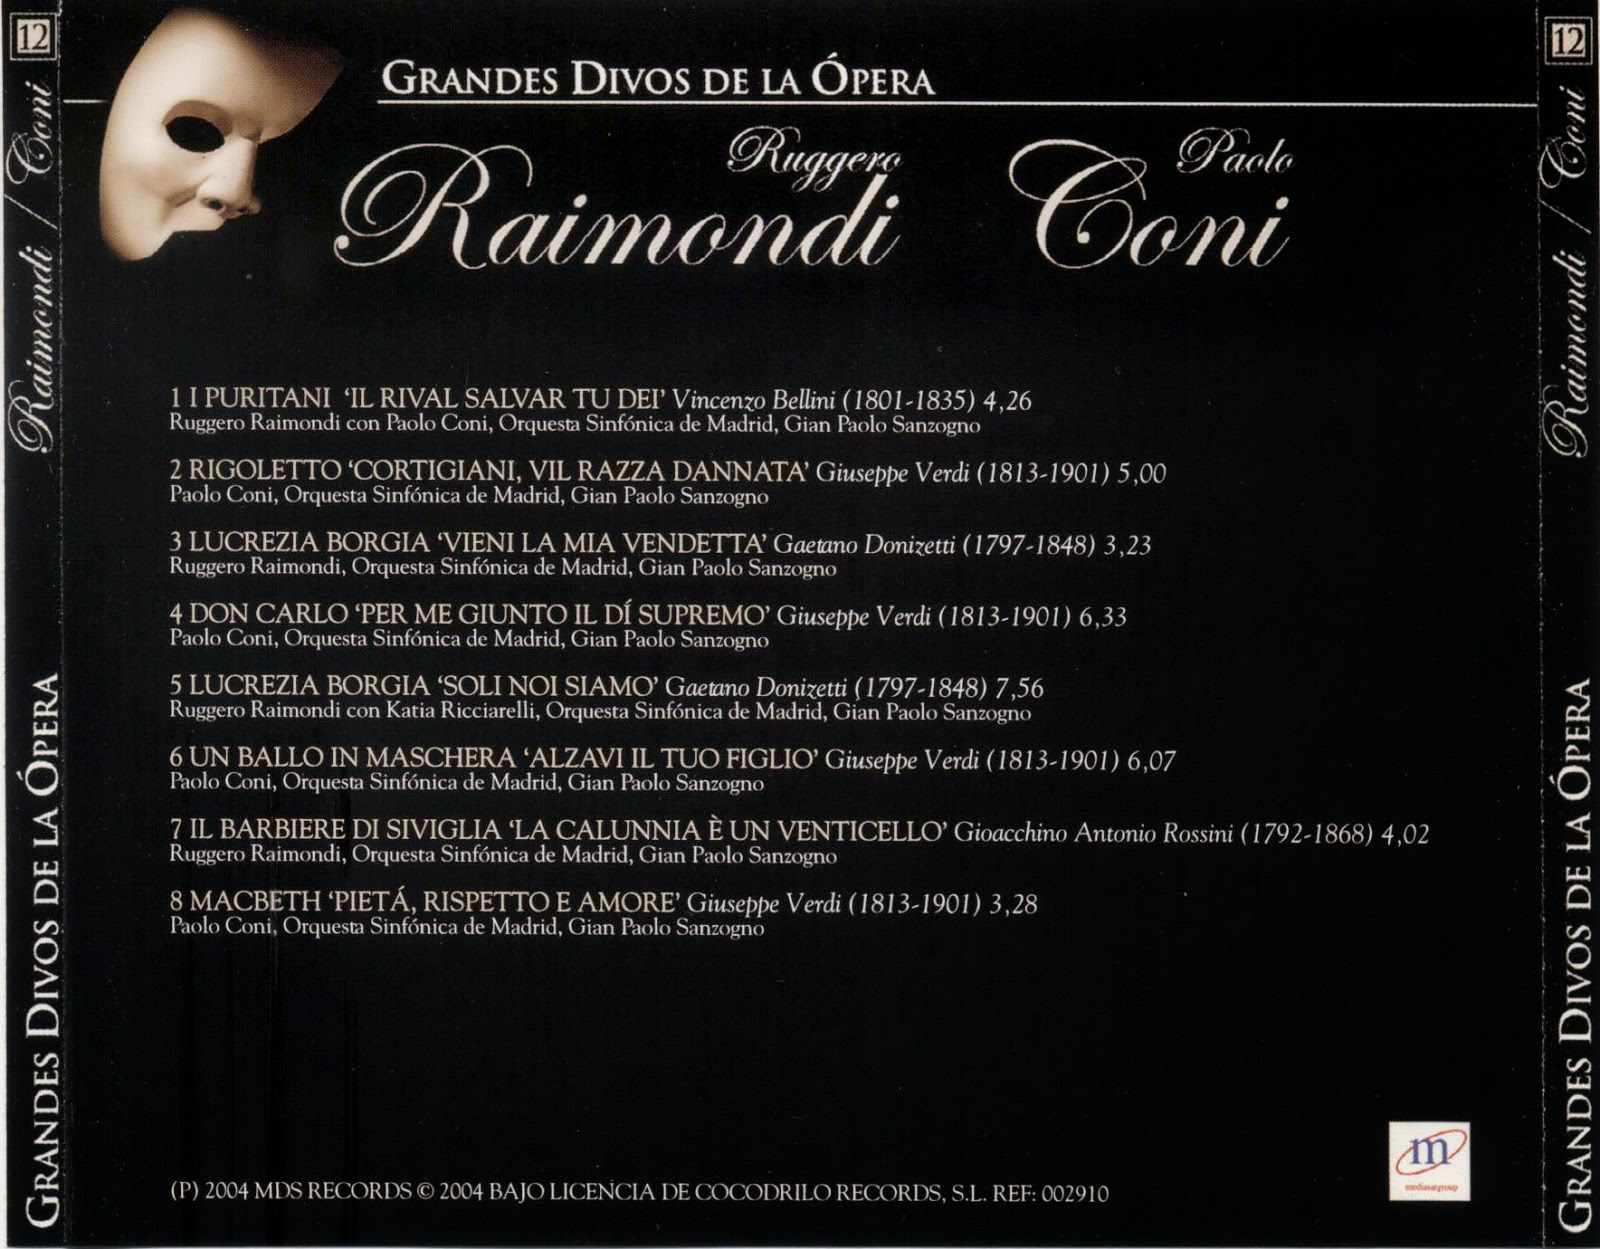 Grandes Divos de la Ópera-cd12.9-Paolo Coni & Ruggero Raimondi-carátula trasera